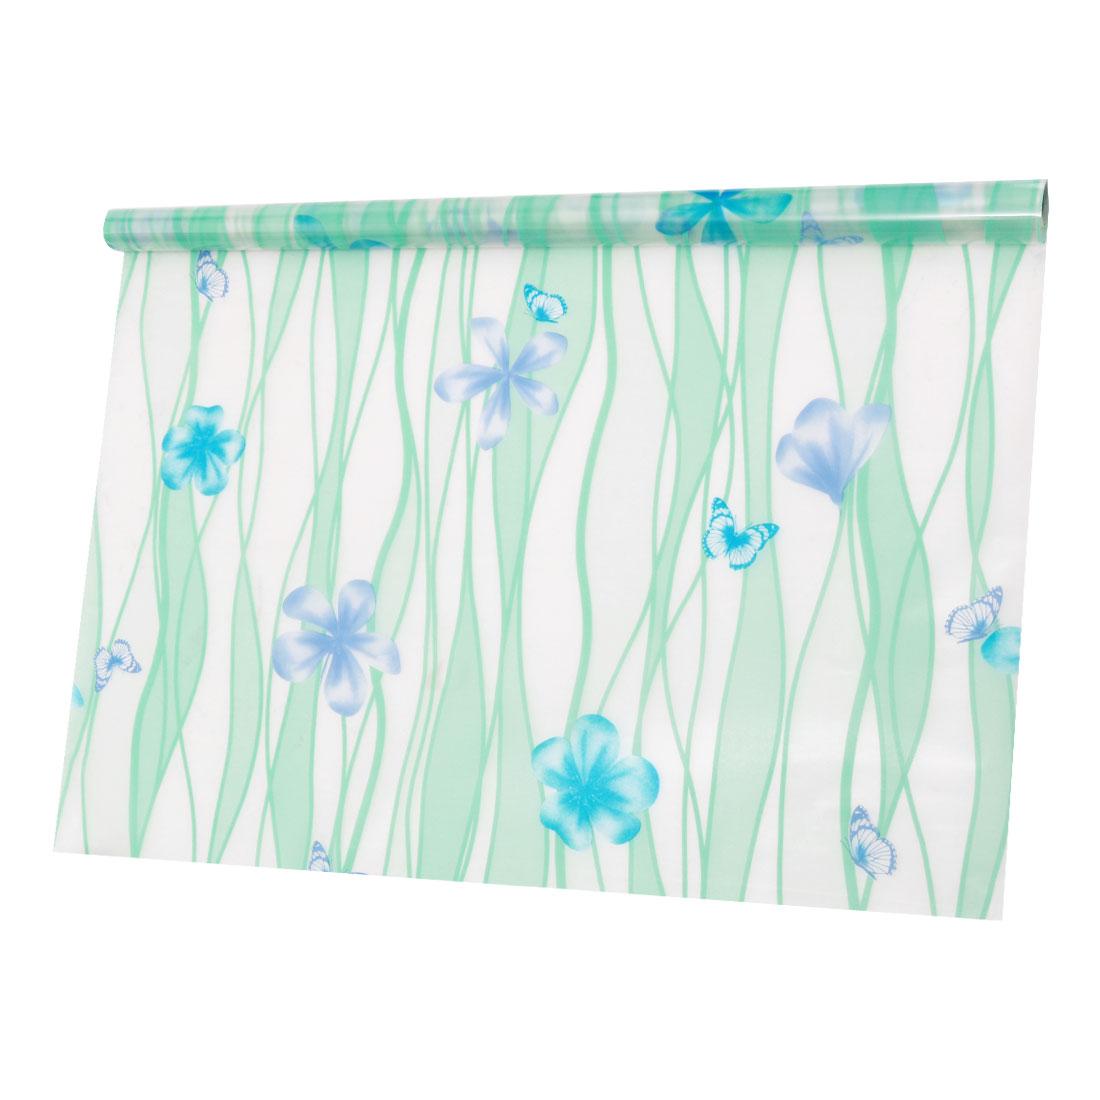 PVC 23.6 x 78.7 Inch Anti UV Glass Window Film Sticker Butterfly Pattern